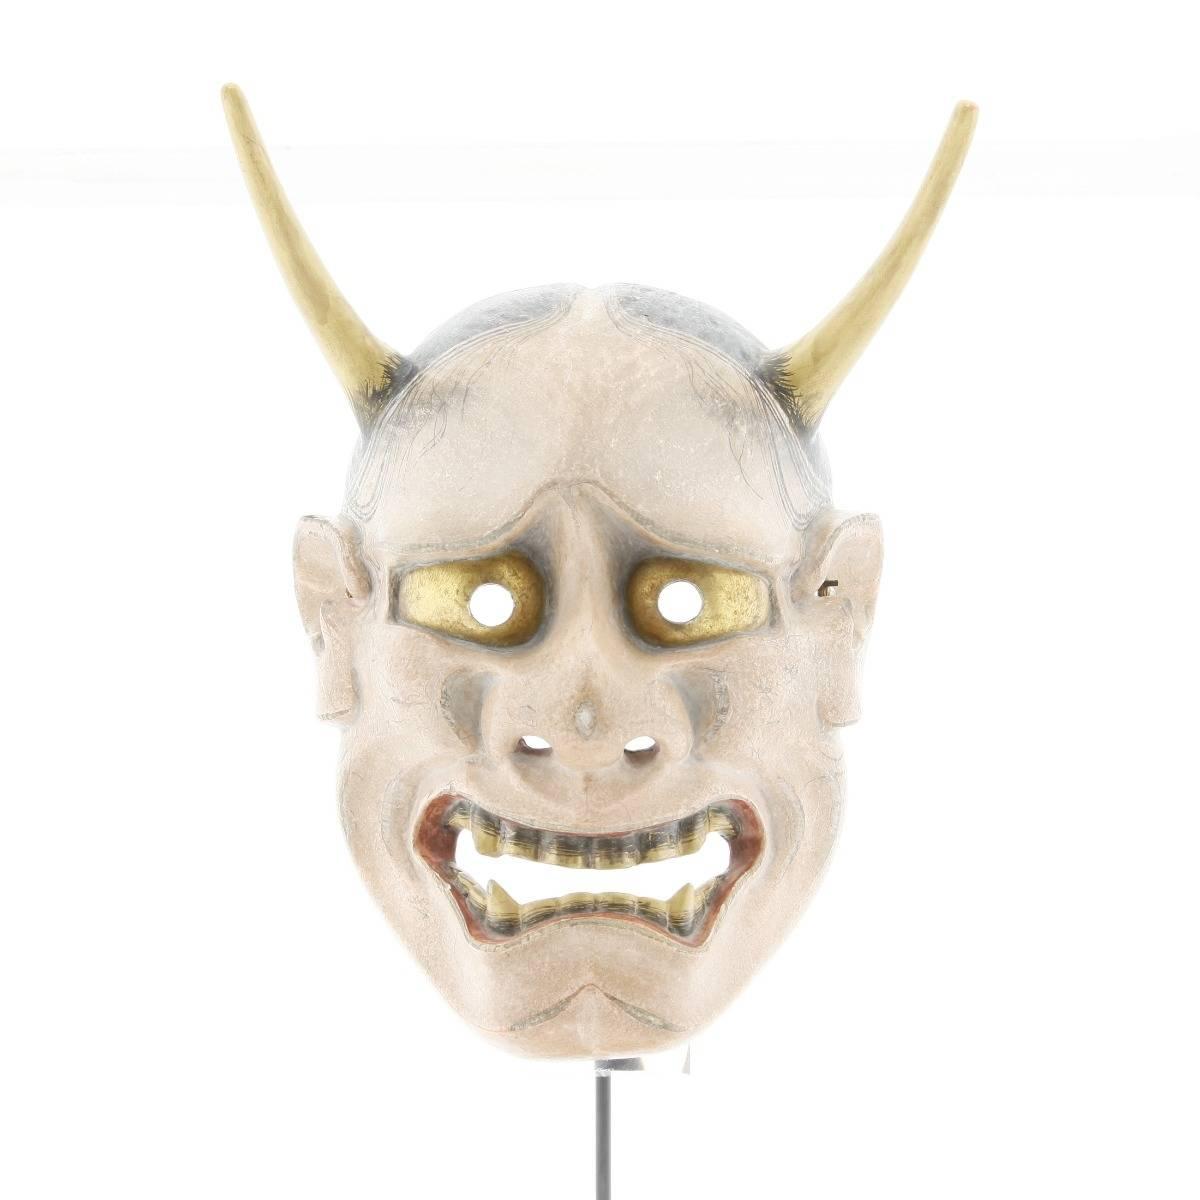 japanese noh mask, hannya